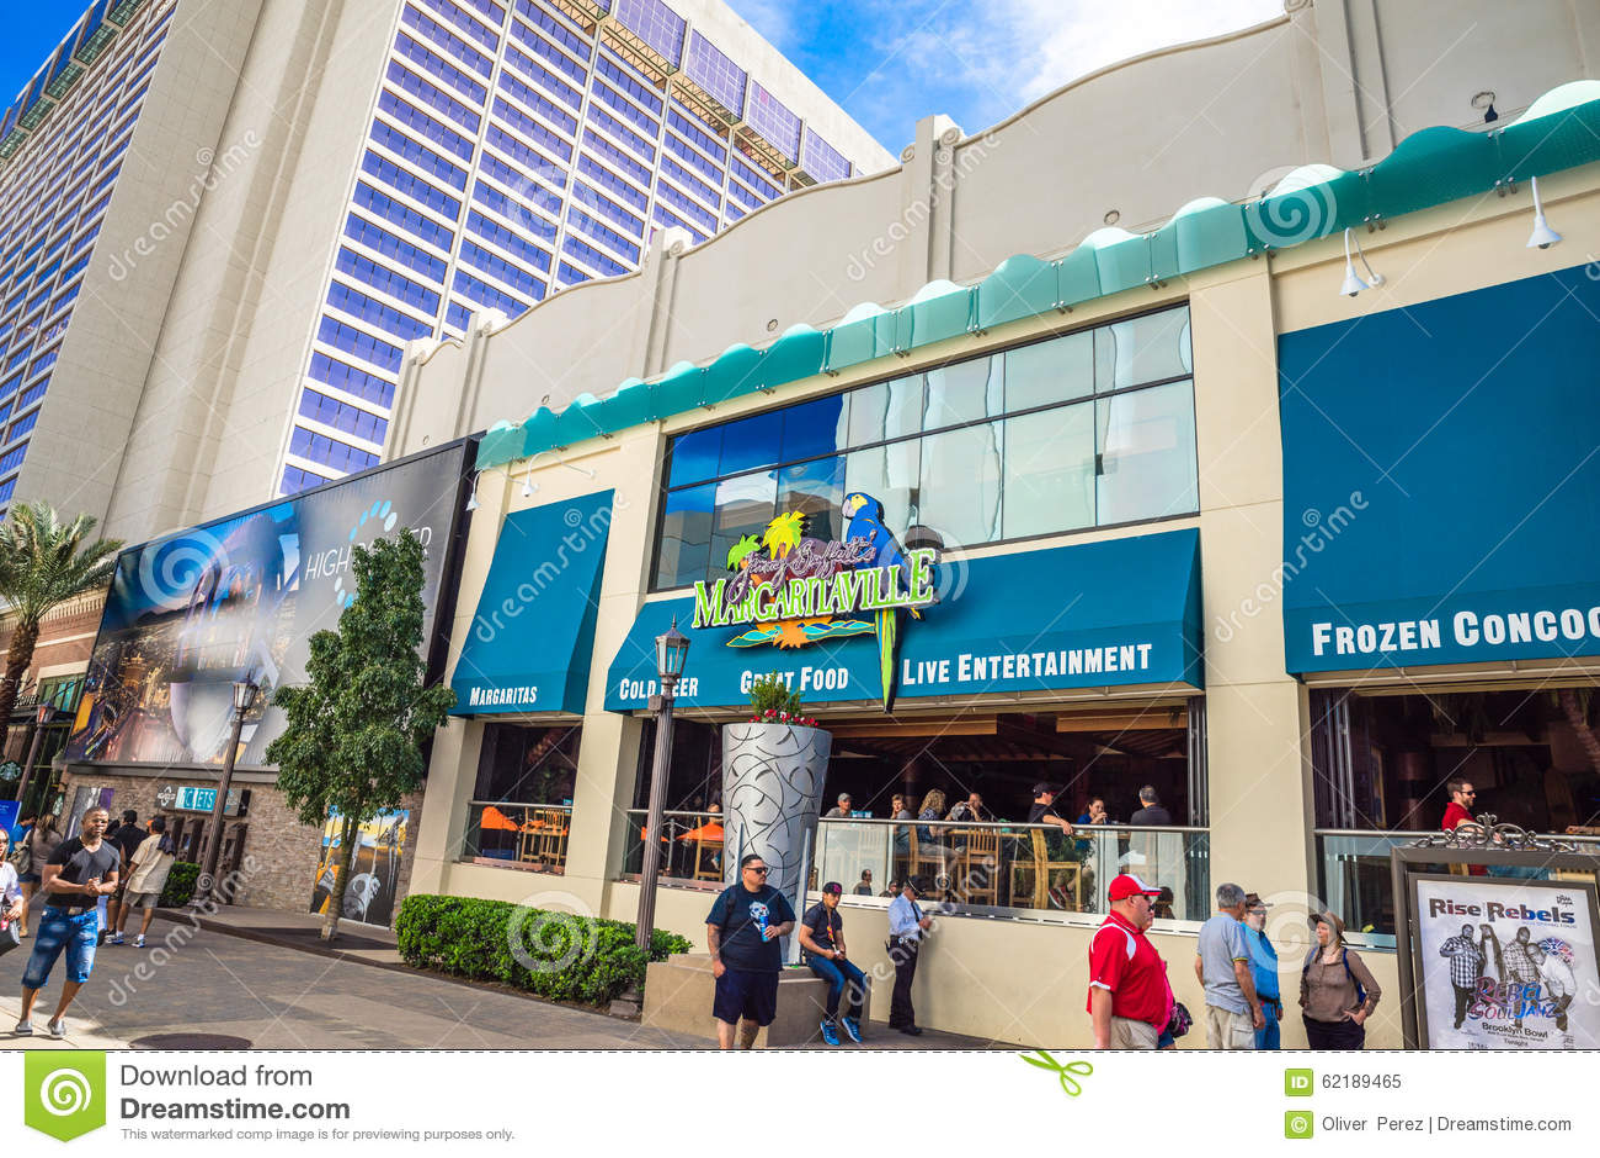 Jimmy Buffett's Margaritaville, Las Vegas | Flickr - Photo ... |Margaritaville Las Vegas Food